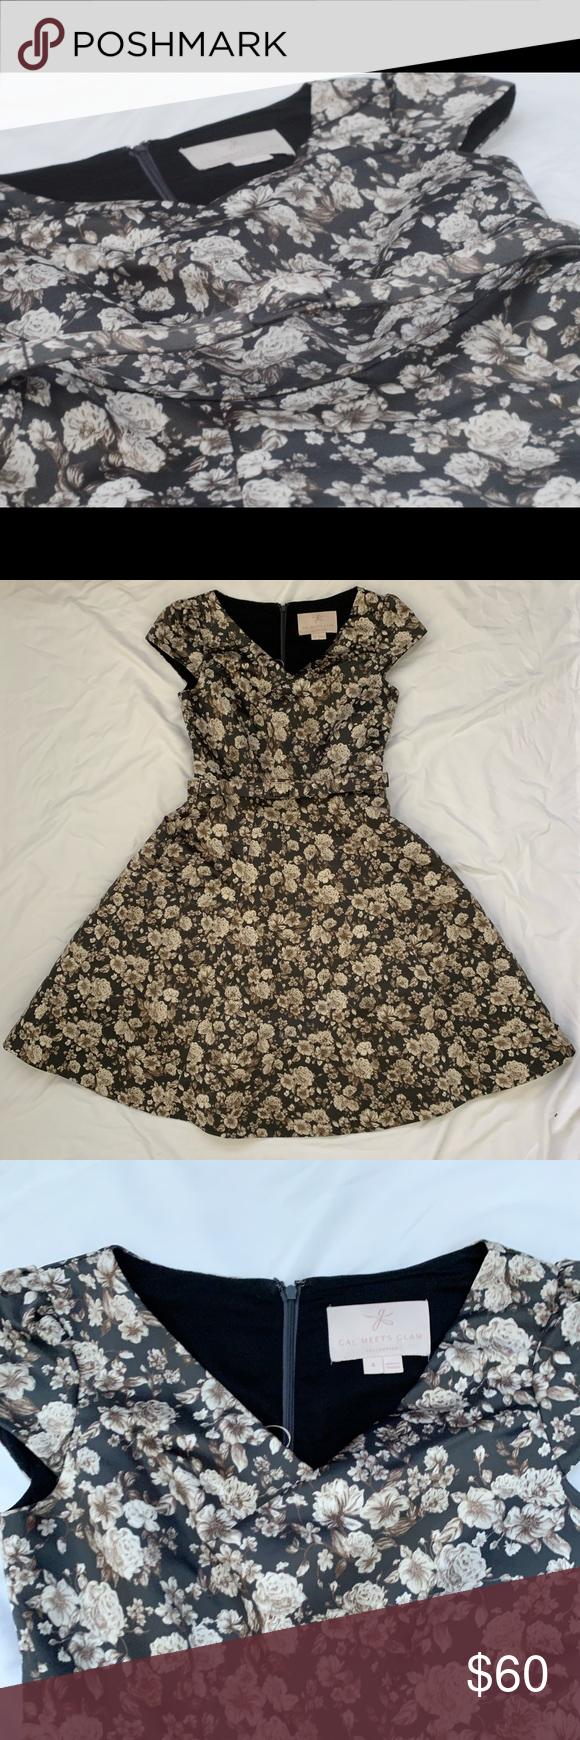 Elle Brightex Duchess Satin Dress Coffee/Taupe Floral Midi Dress, Worn Once Gal Meets Glam Dresses Midi